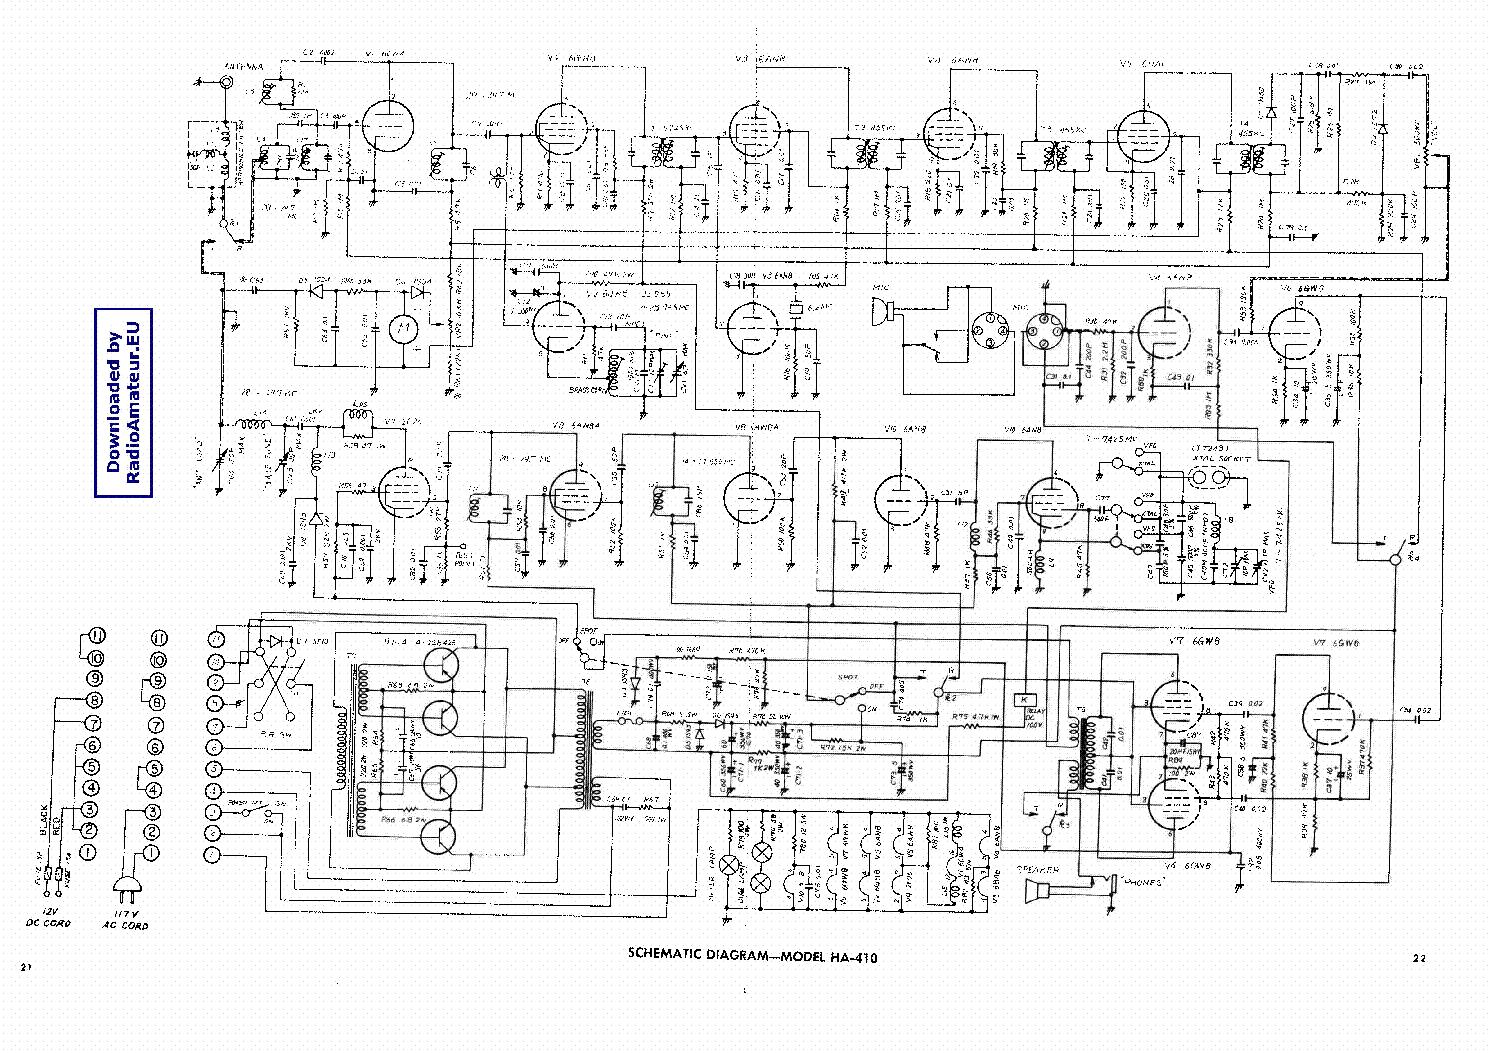 Lafayette Lms40 Service Manual Download Schematics Eeprom Repair Wiring Diagrams Ha410